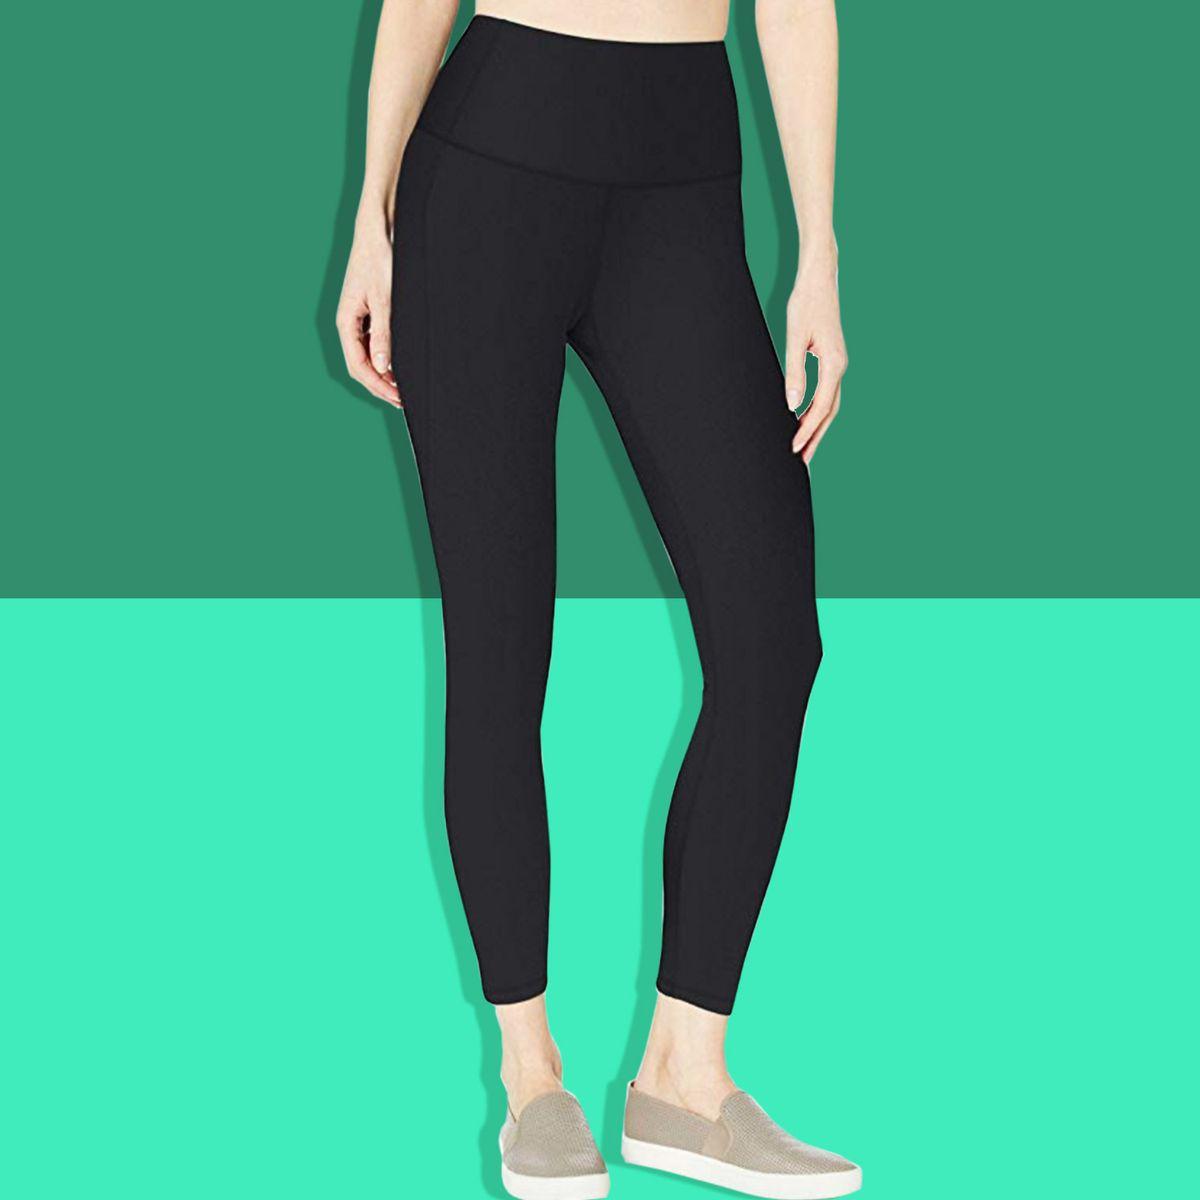 C9 Champion Workout Leggings Amazon Sale 2020 The Strategist New York Magazine